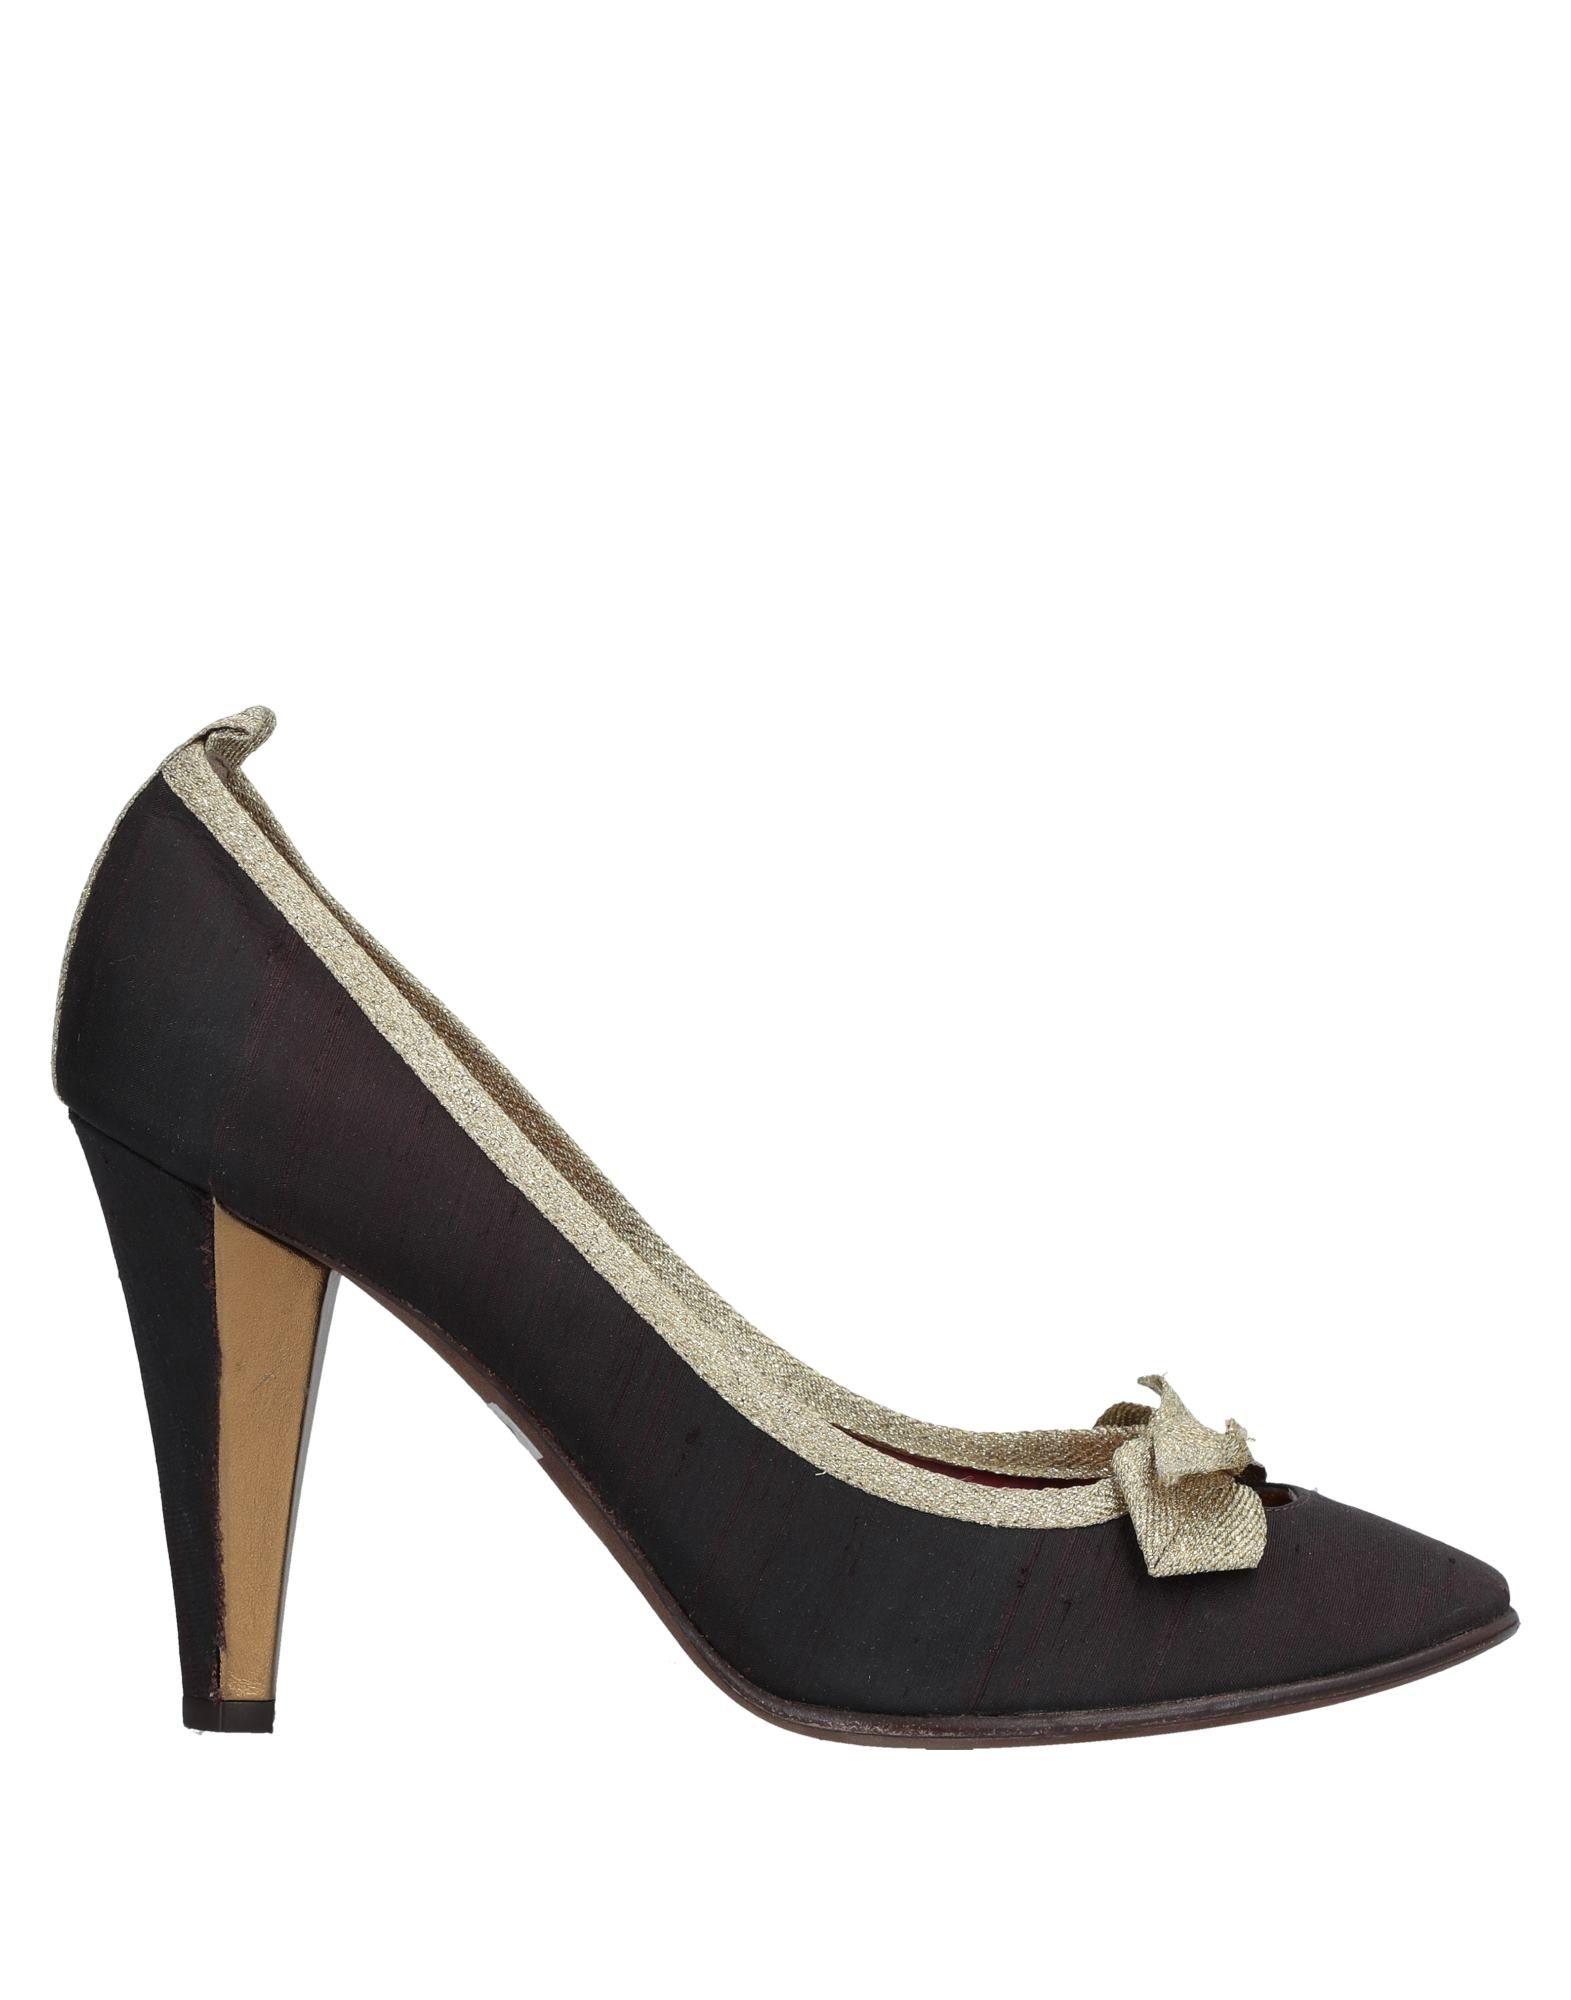 Stilvolle billige Schuhe Marc By Marc Jacobs Pumps Damen  11529113FN